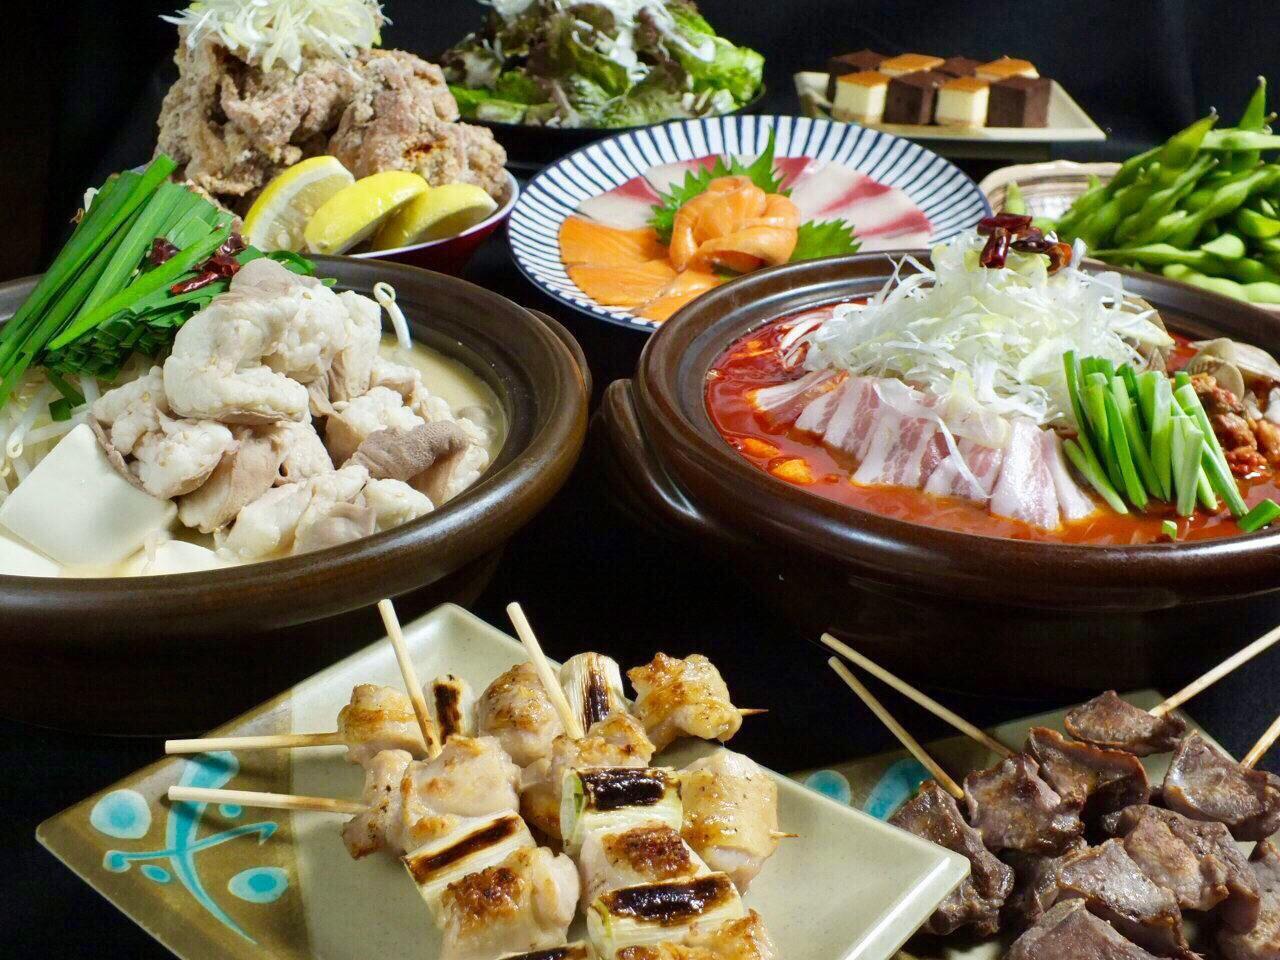 【2時間飲み放題付】選べる鍋コース〈全8品〉宴会・飲み会・女子会・歓迎会・送別会